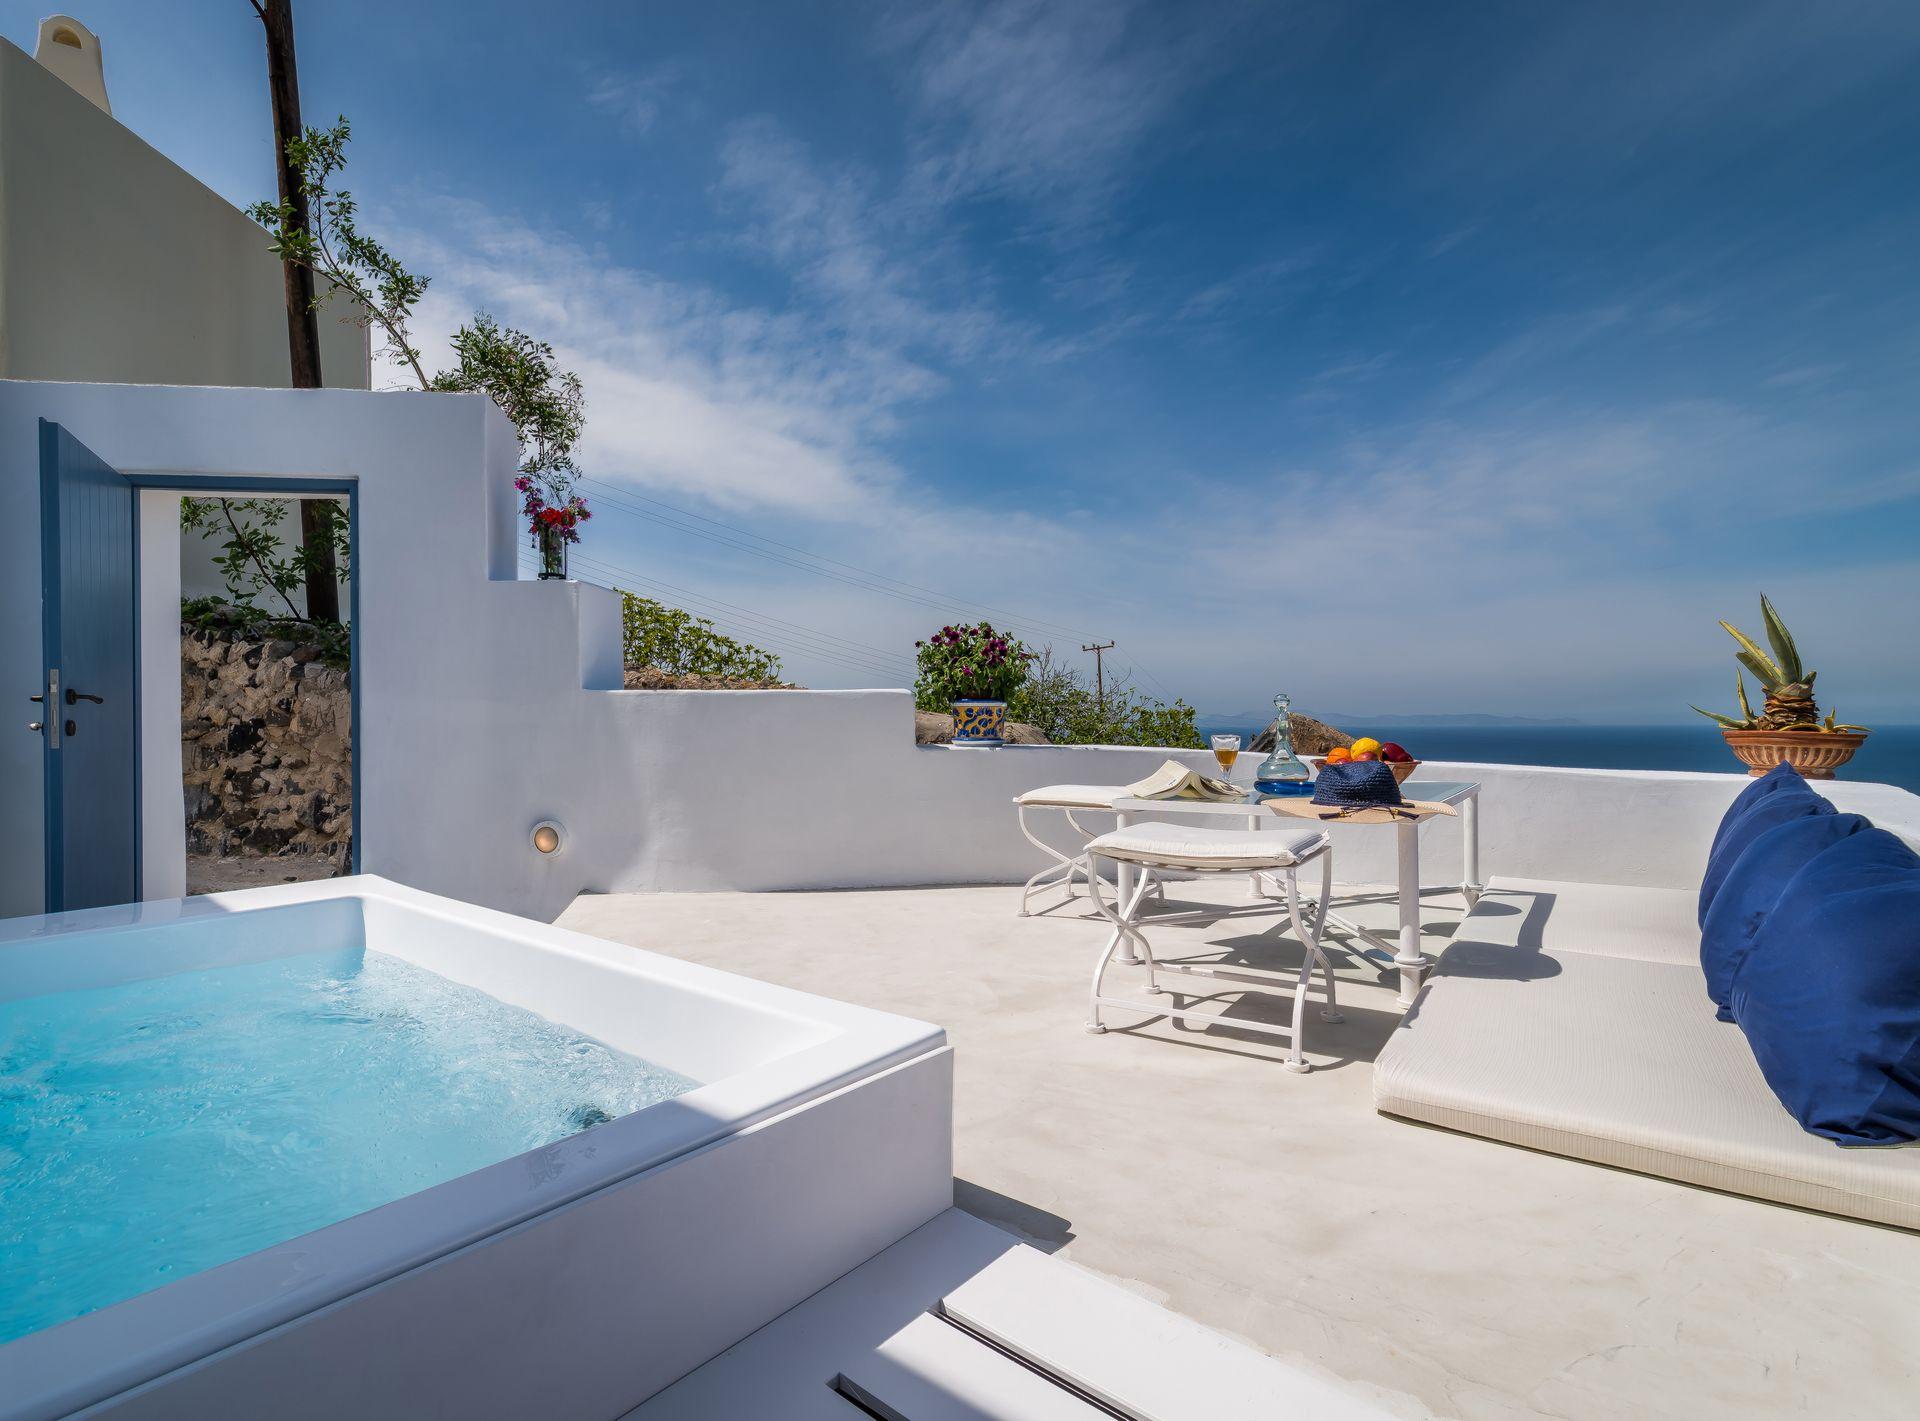 Fava Eco Residences Santorini – Σαντορινη ✦ -30% ✦ 2 Ημερες (1 Διανυκτερευση) ✦ 2 Άτομα ΚΑΙ ενα Παιδι εως 6 ετων ✦ Πρωινο ✦ 01/09/2018 εως 30/09/2018 ✦ Κοντα στην Παραλια!